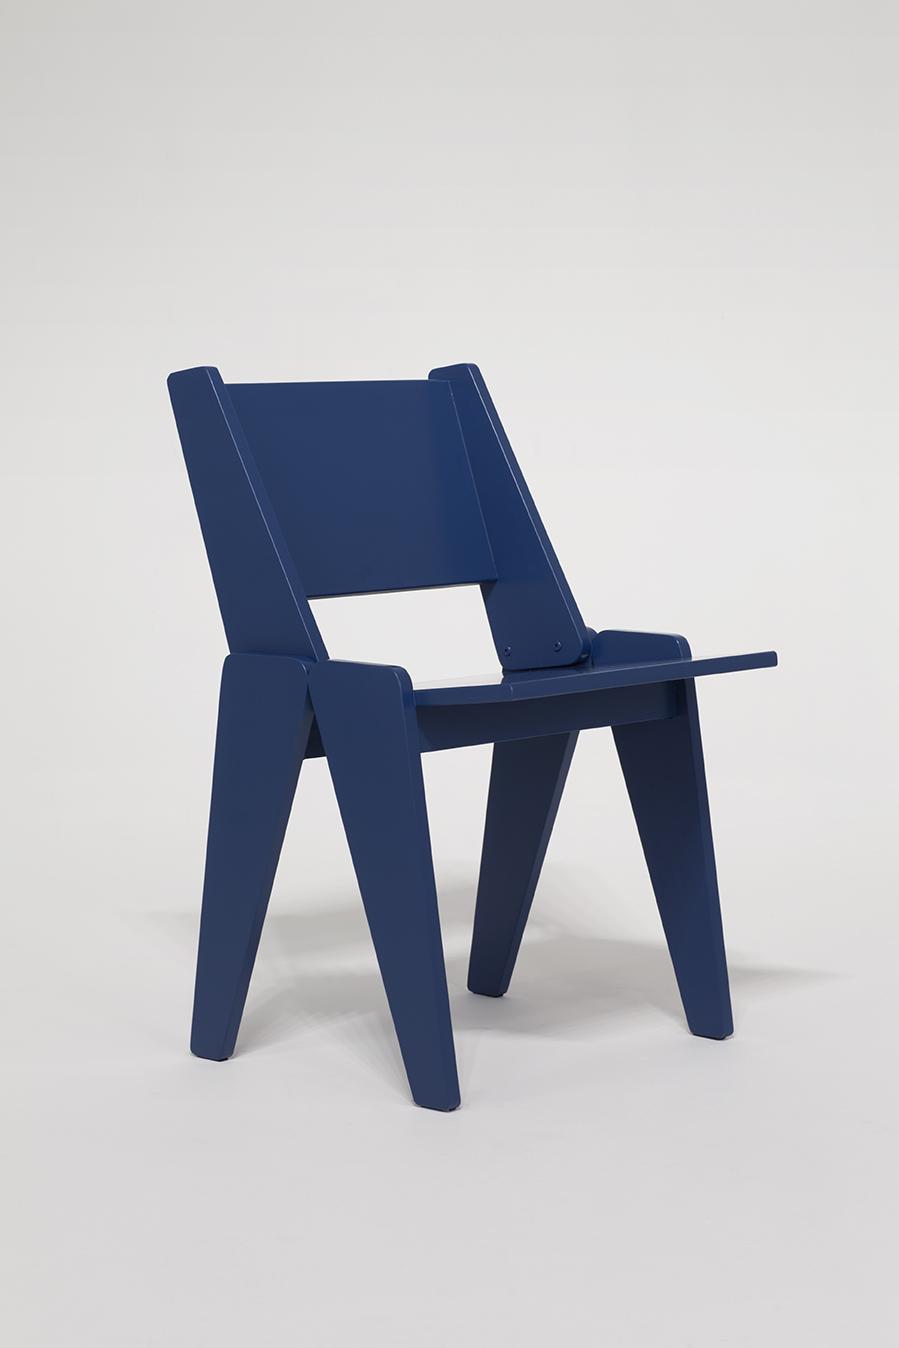 Alcindo Cadeira - Estudio - TokStok - Mauricio Arruda.jpg